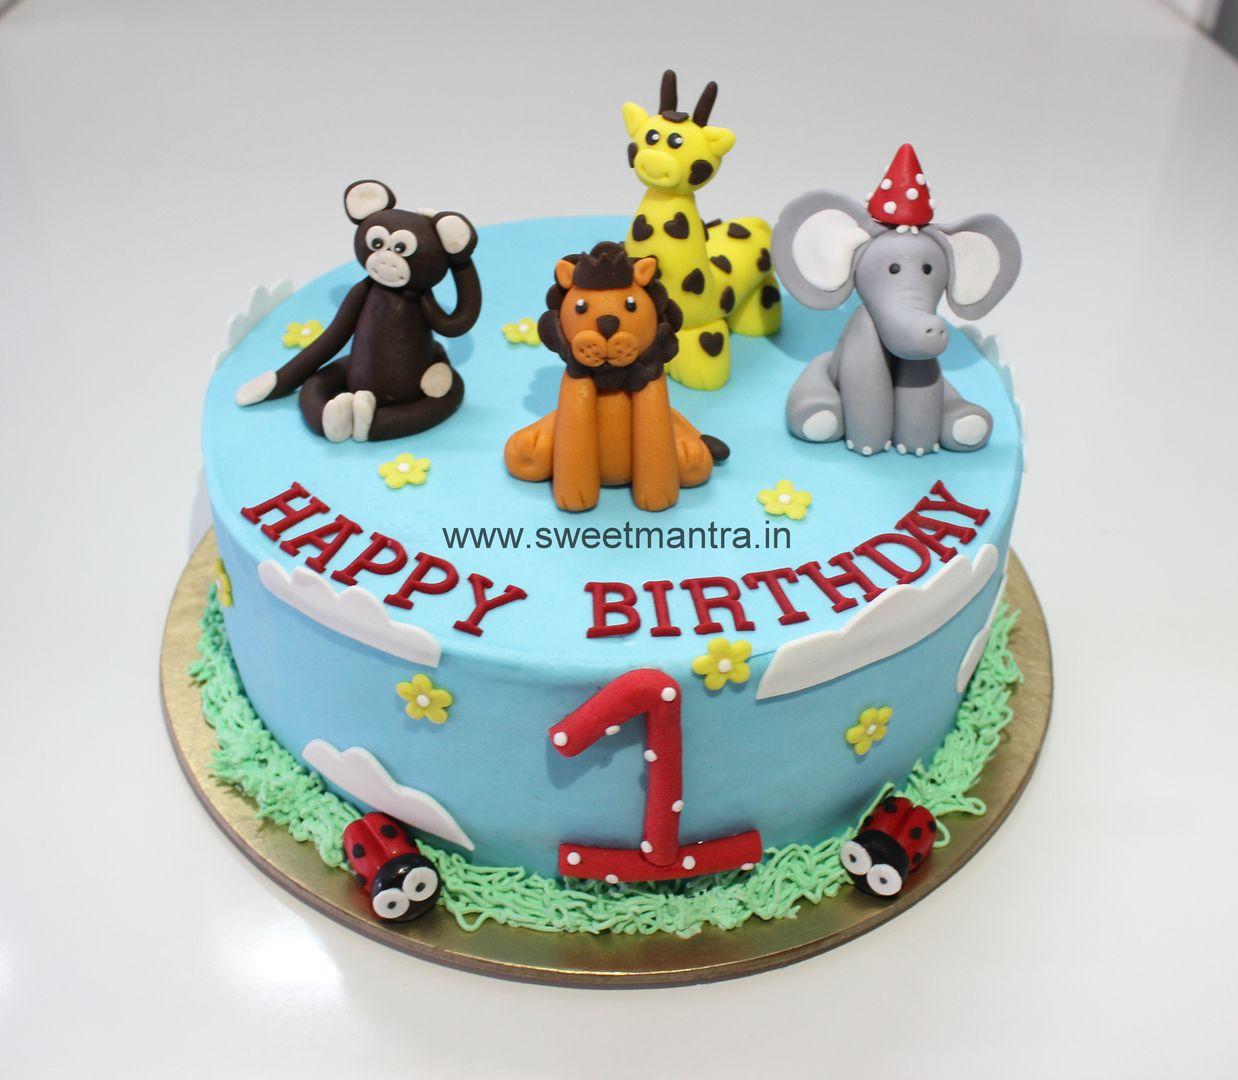 Order Send Eggless Cartoon Kids Theme Birthday Cake Delivery Pune Animal Birthday Cakes Birthday Cake Delivery Jungle Cake